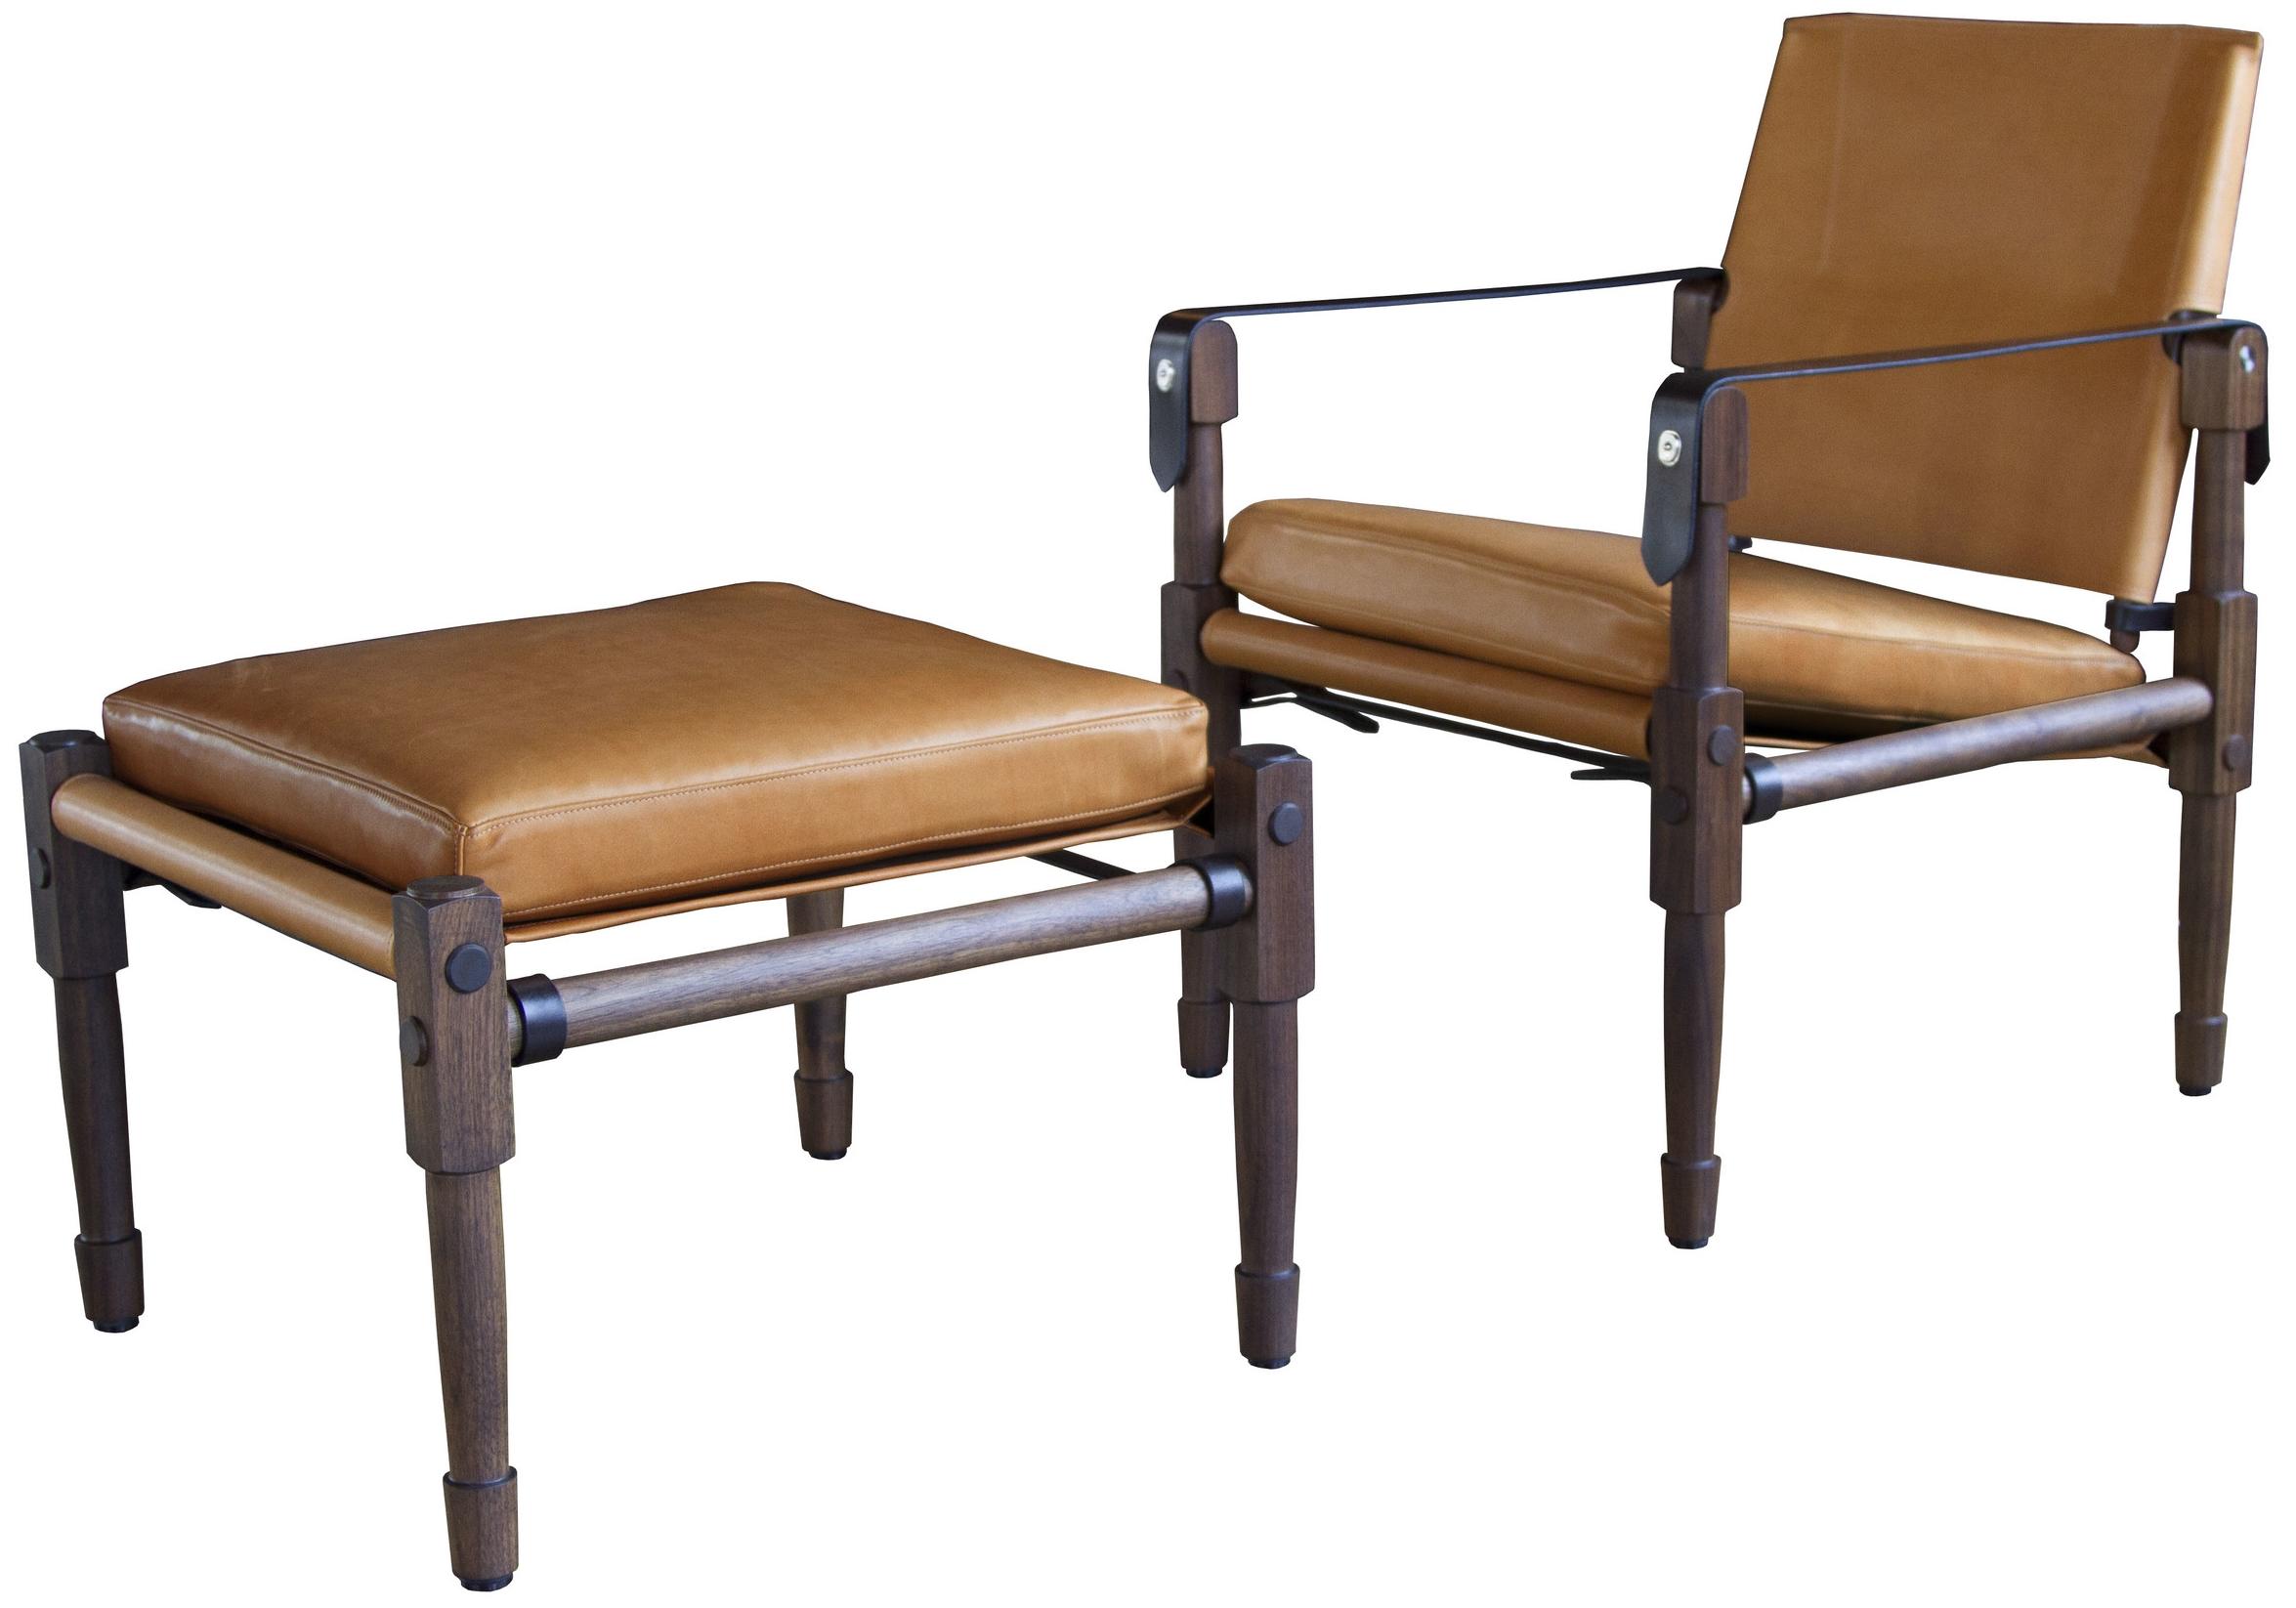 Chatwin Lounge Chair